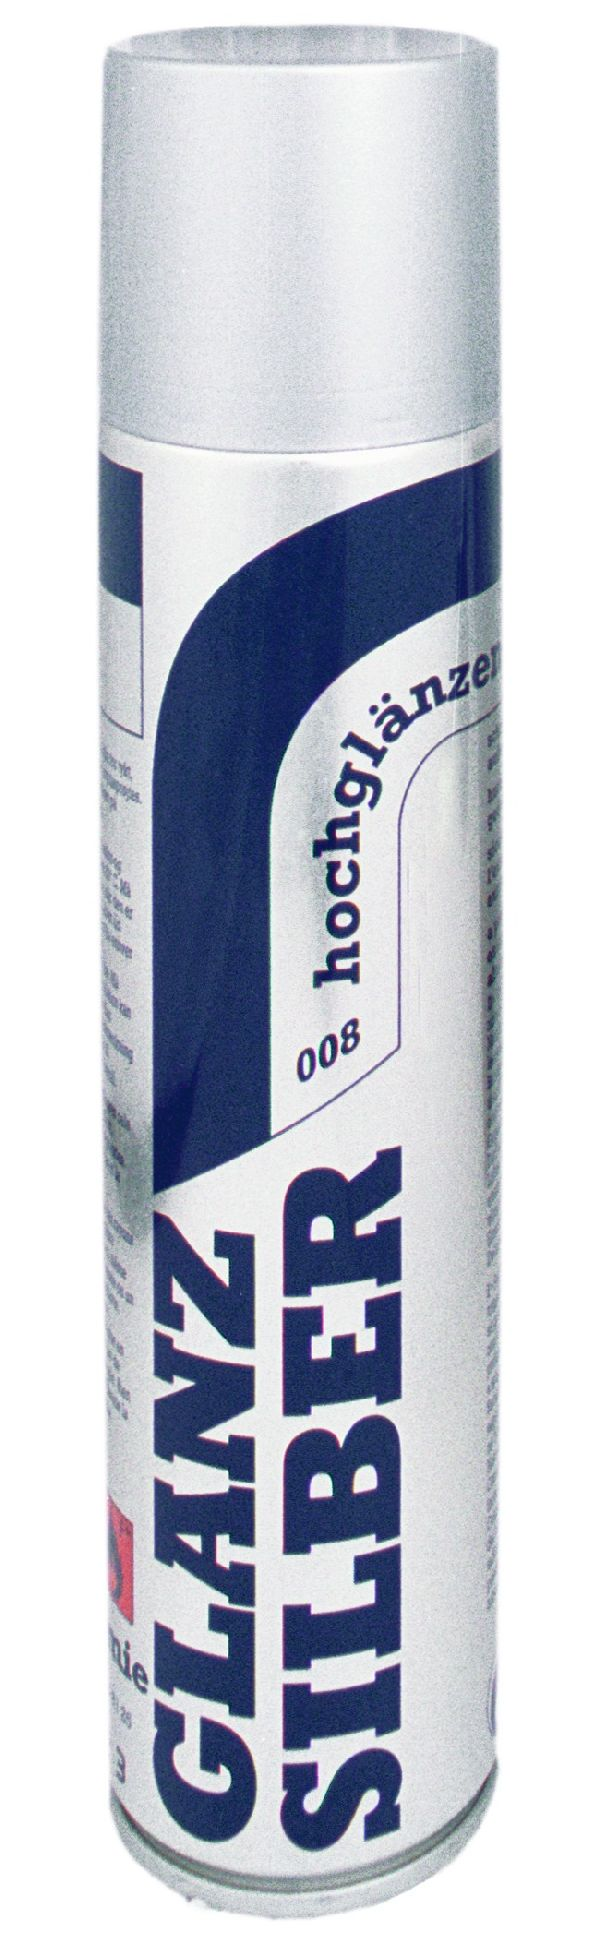 Sprühlacke SILBER 008 400 ml